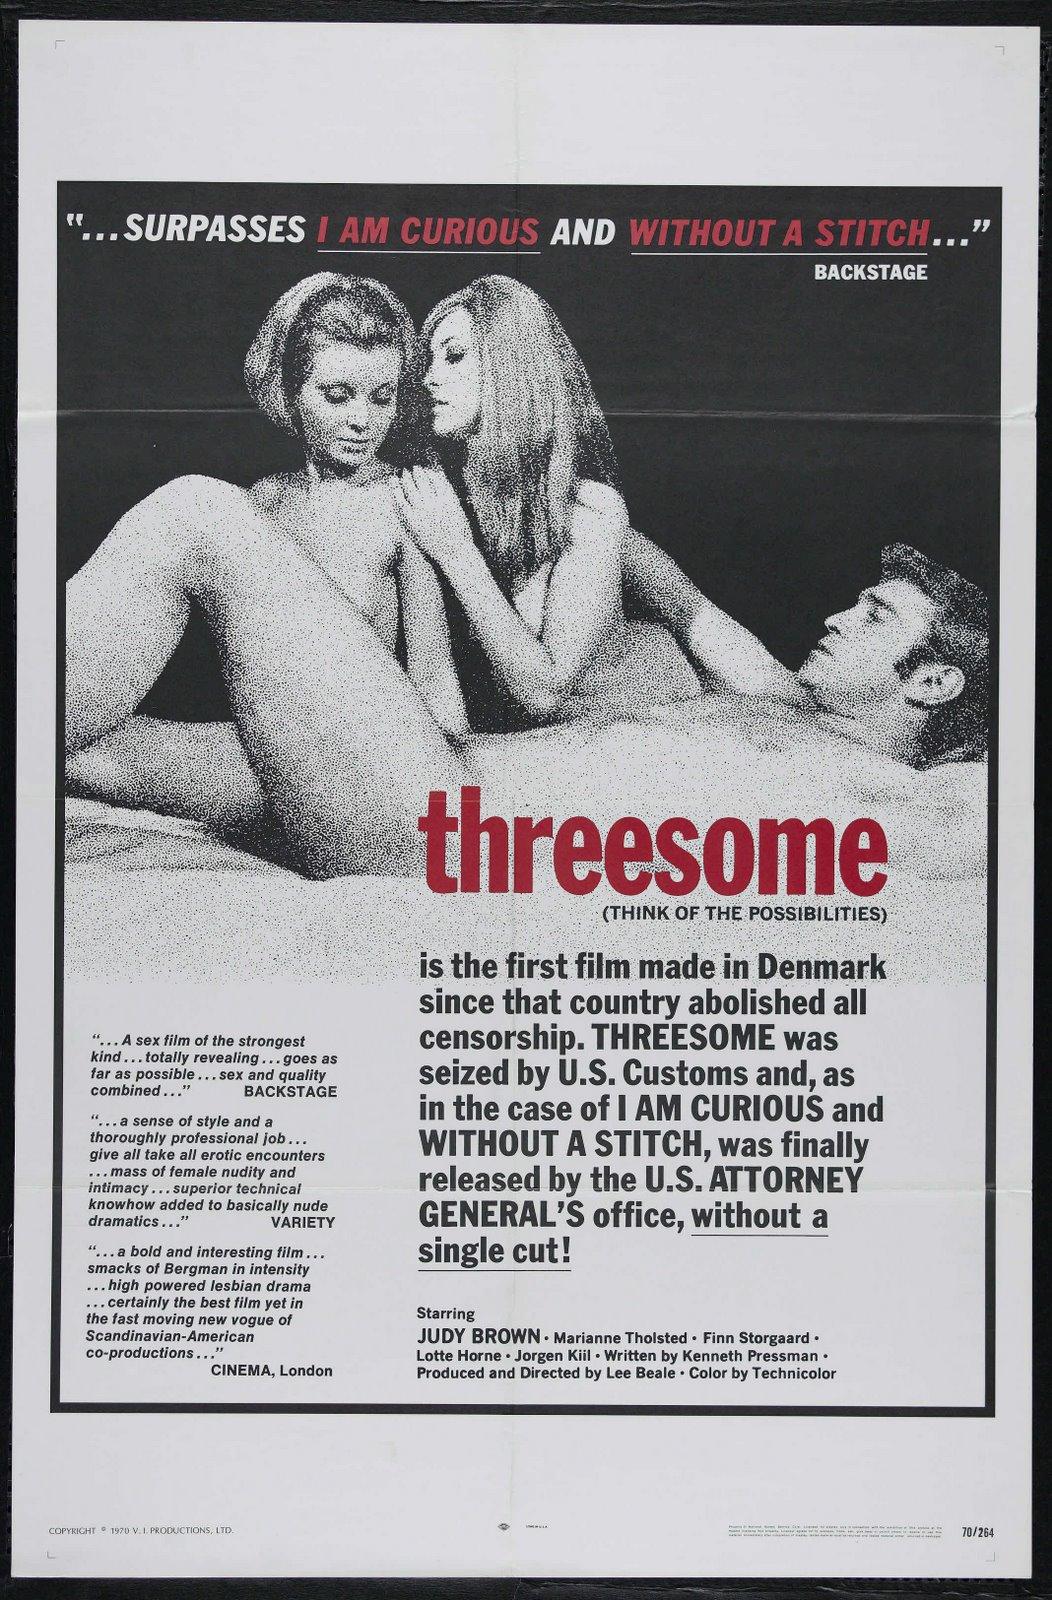 Threesome vegas bad boy